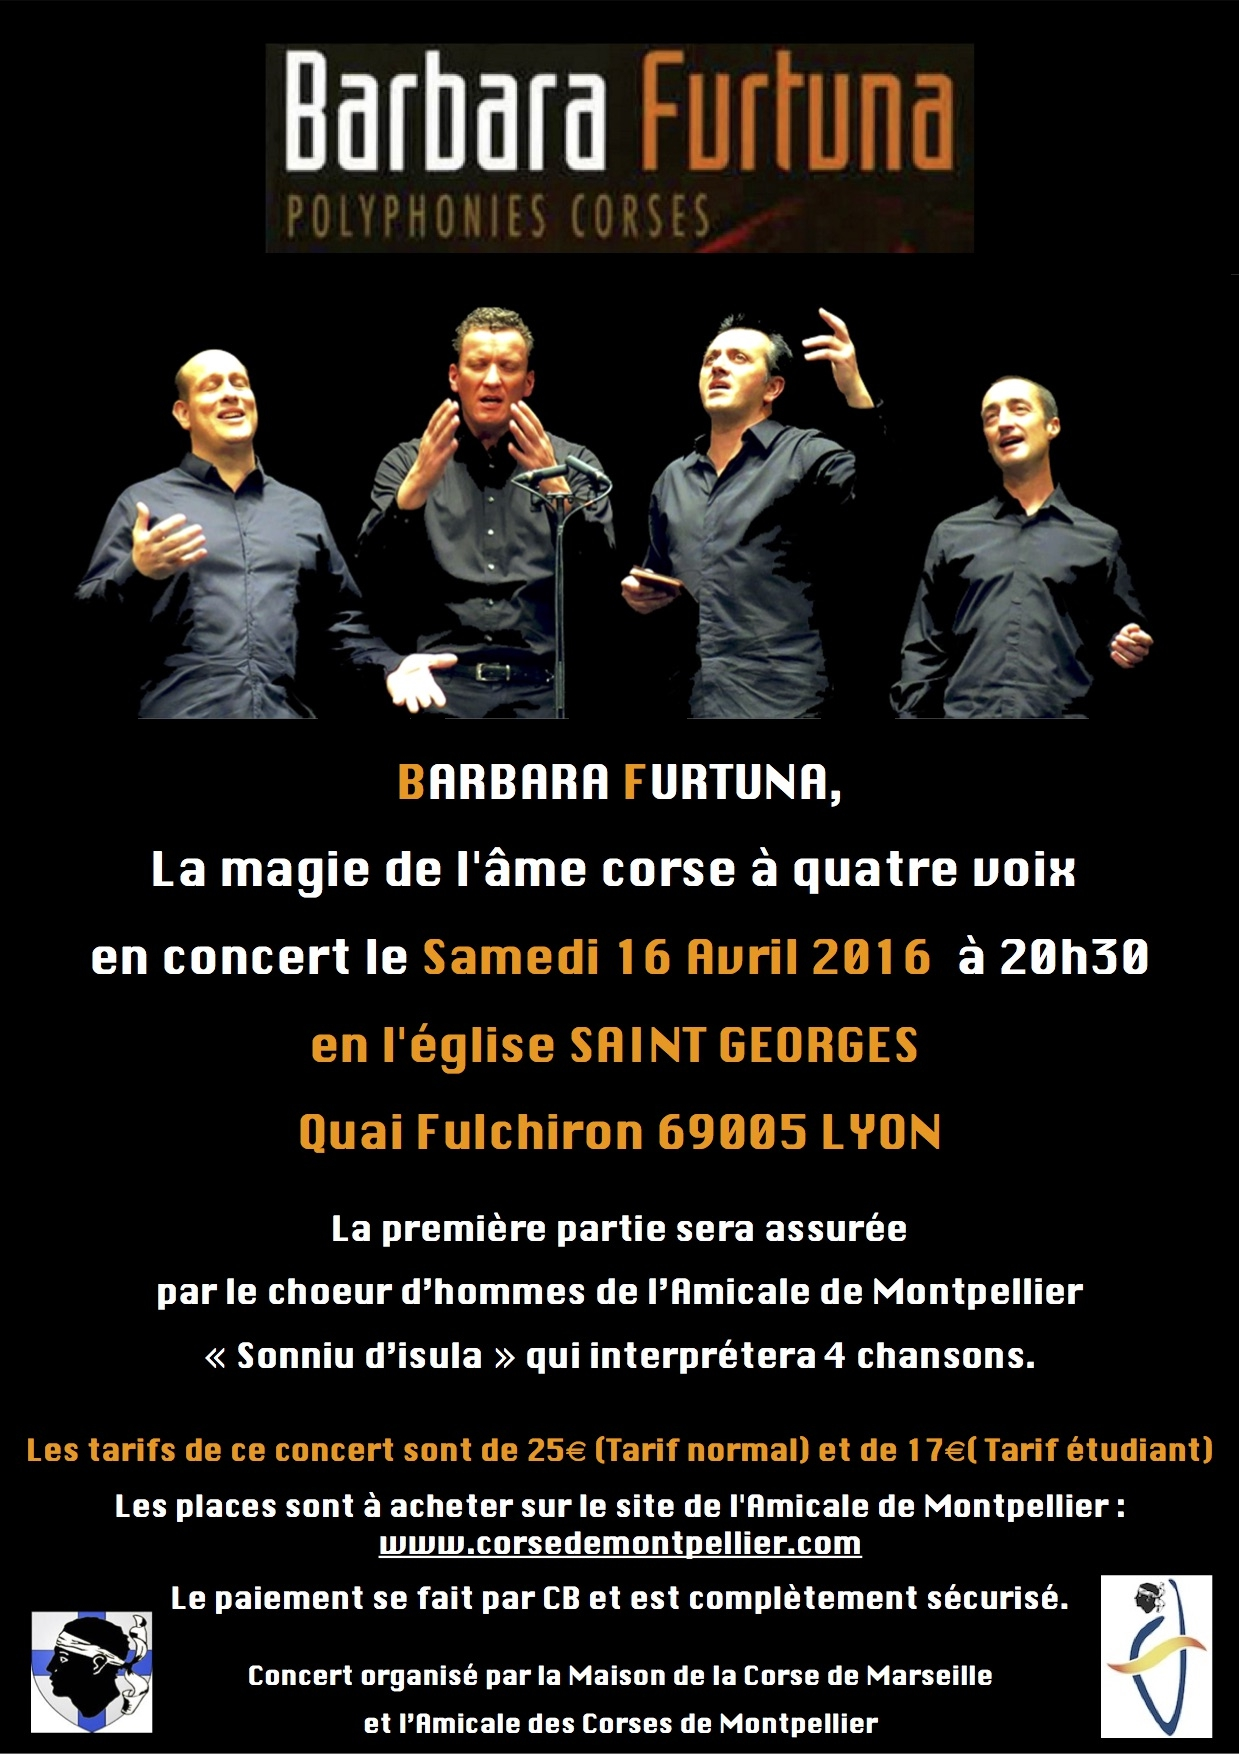 Barbara Furtuna en concert à Lyon